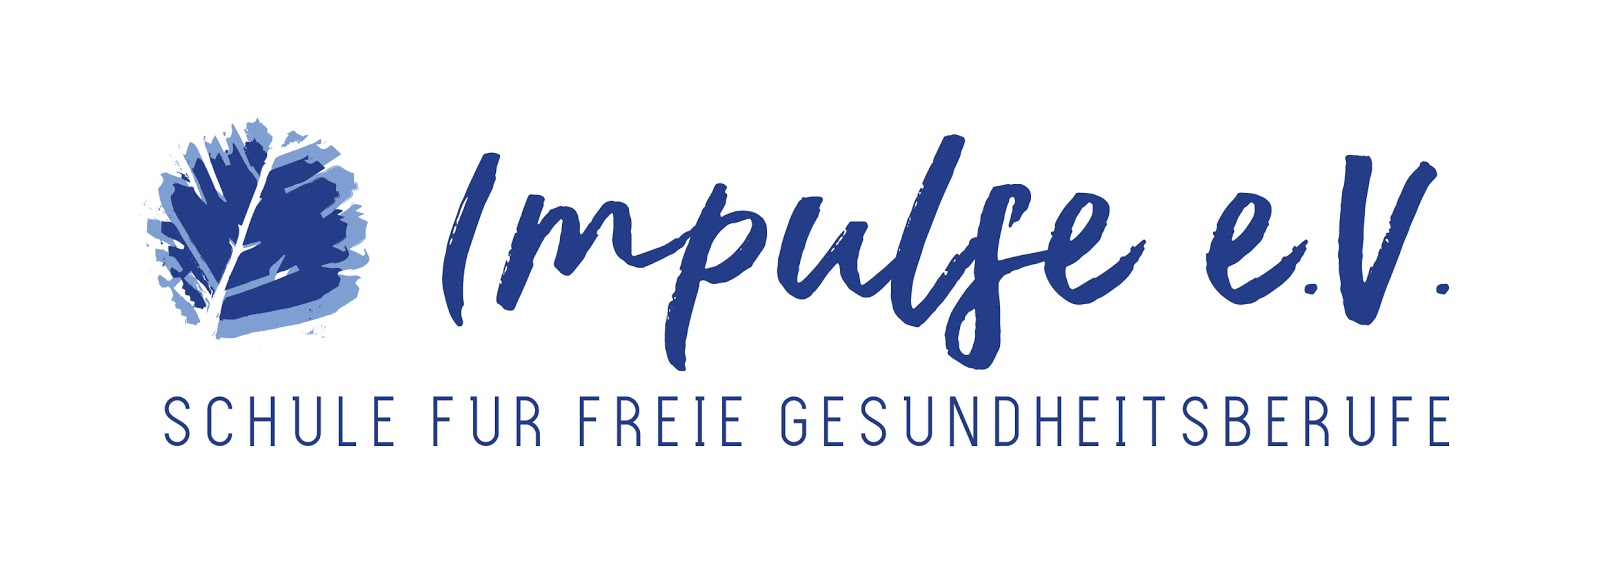 Impulse e.V. - Schule für freie Gesundheitsberufe: 2018